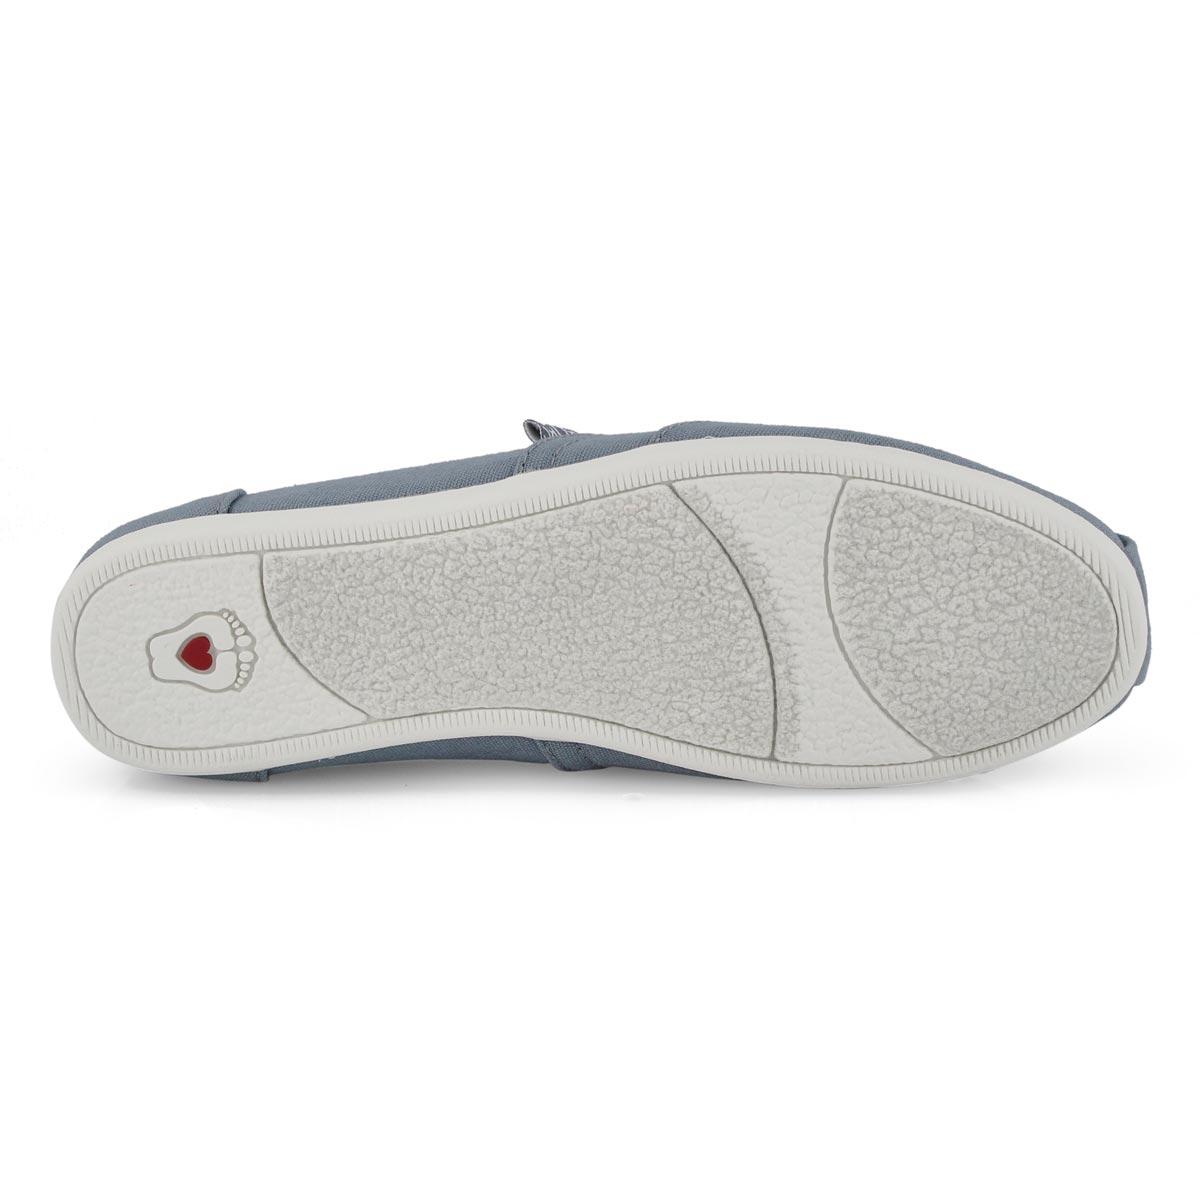 Women's Bobs Plush Peace & Love Shoe - Slate